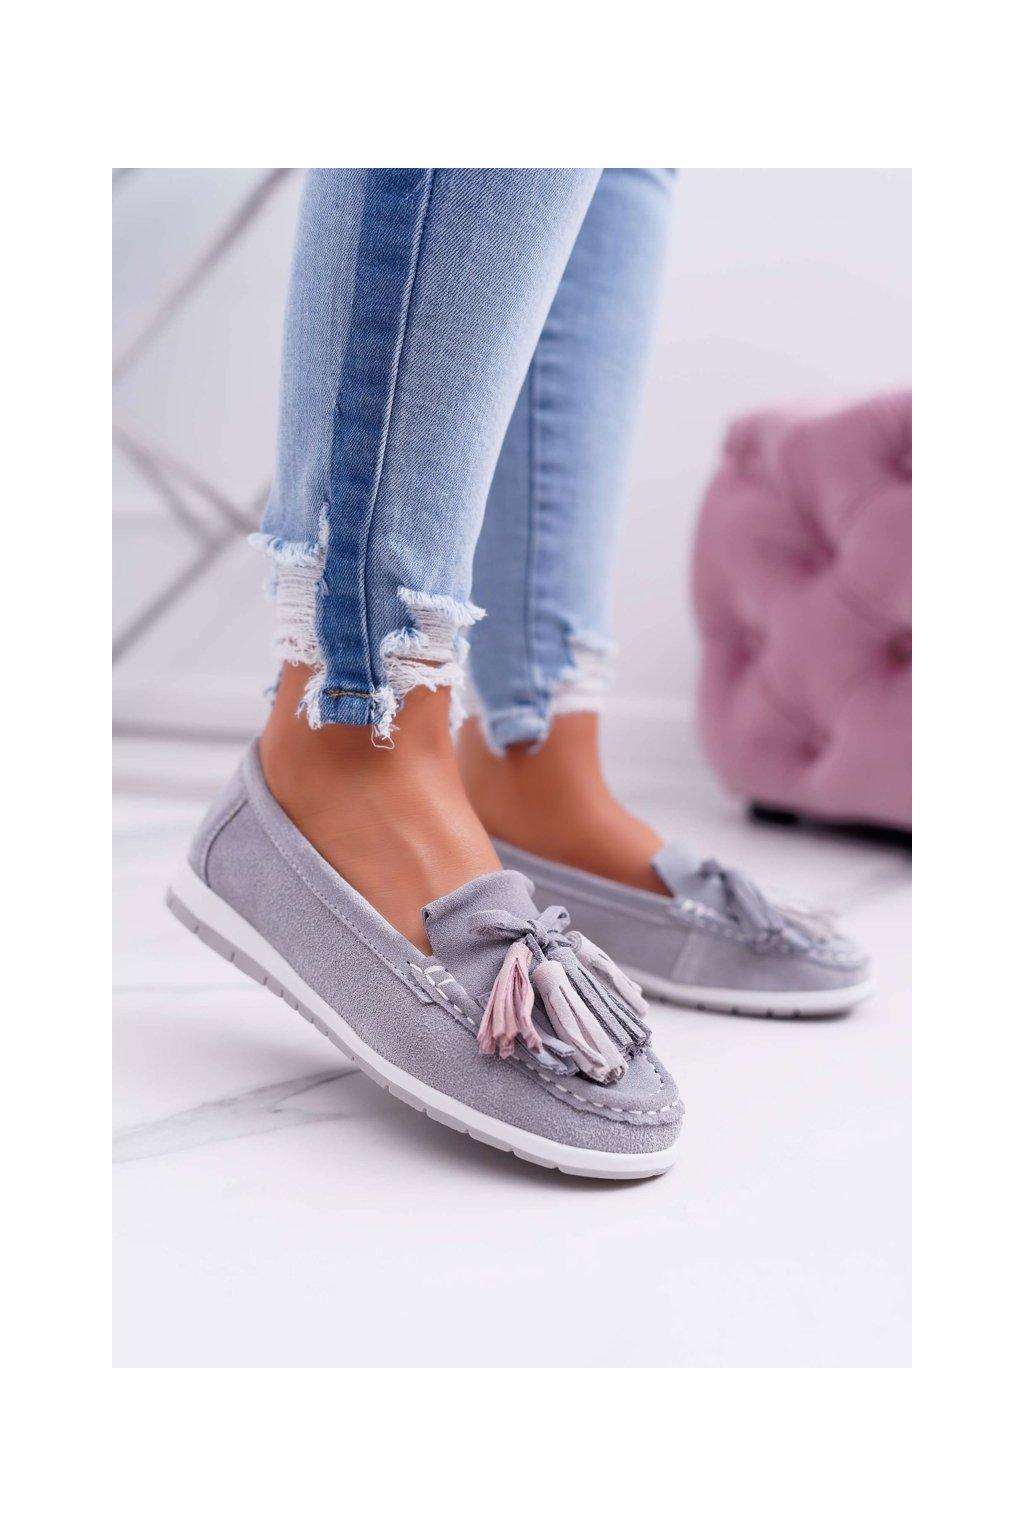 Dámske mokasíny farba sivá kód obuvi 9PB32-1078 LT.GREY